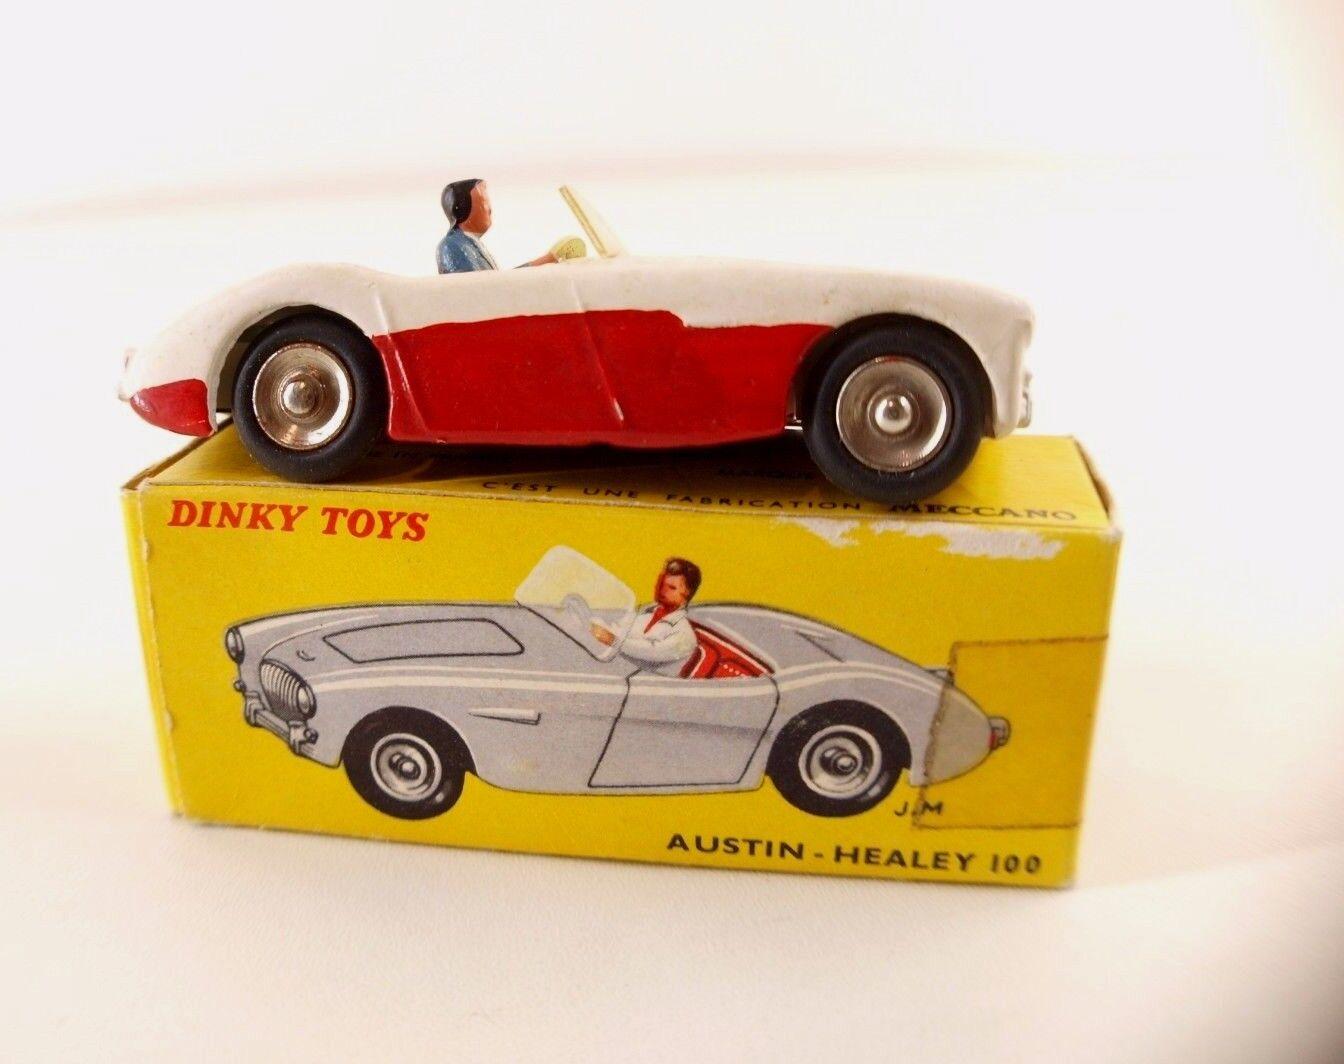 Dinky toys F nº 546 austin healey 100 repainted in box